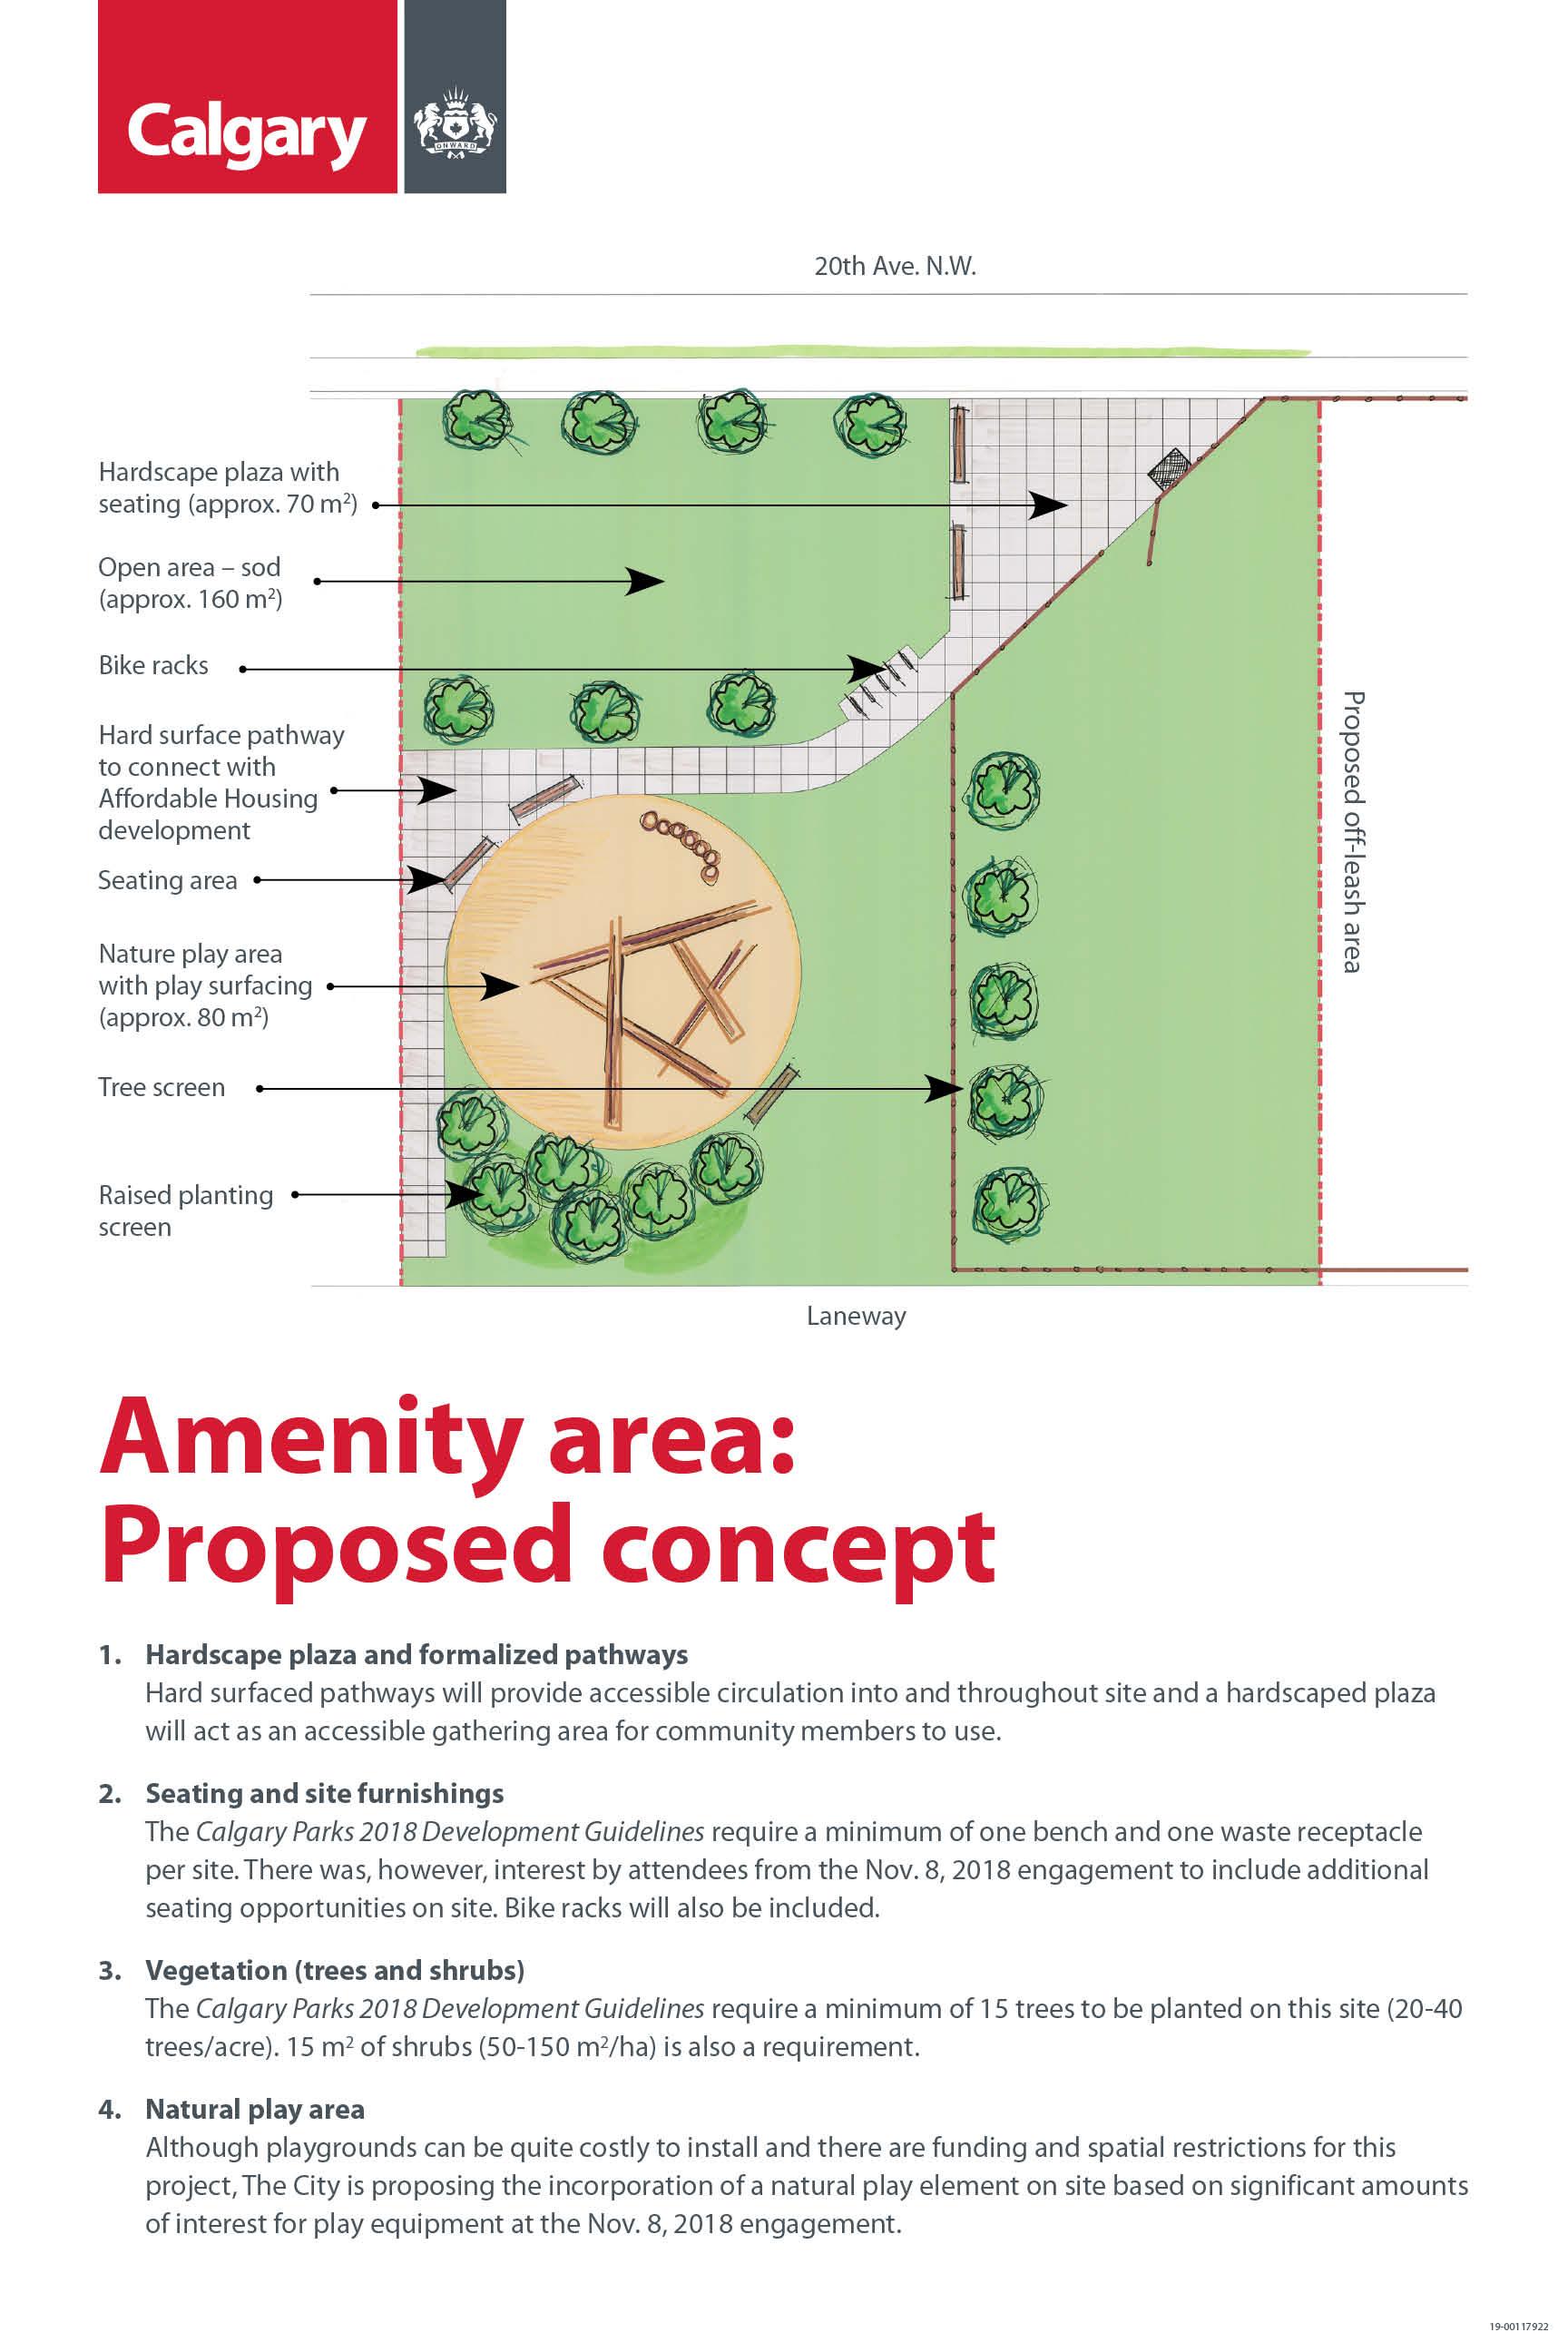 Amenity area concept